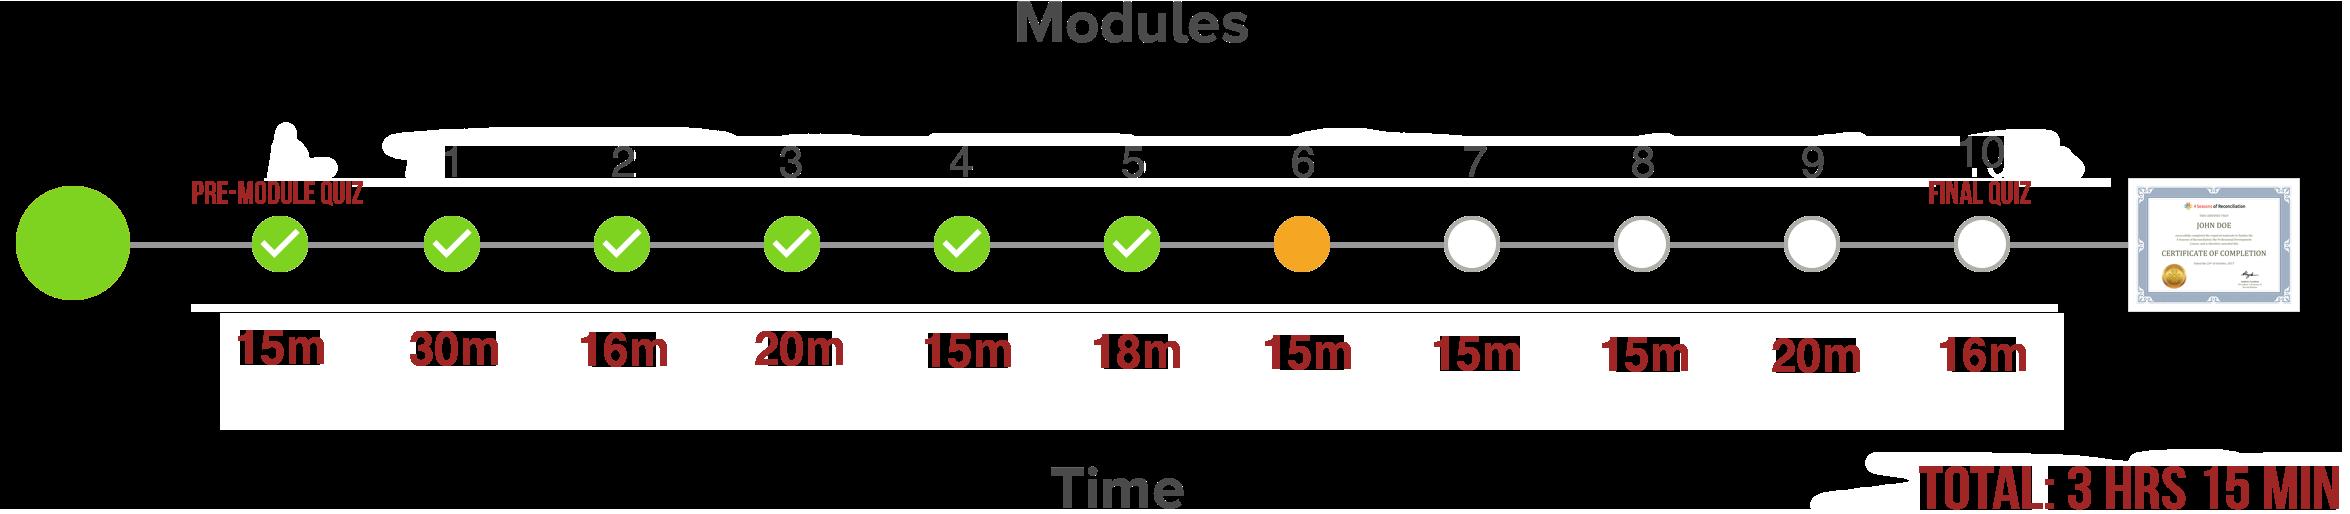 Module6_Orange.png